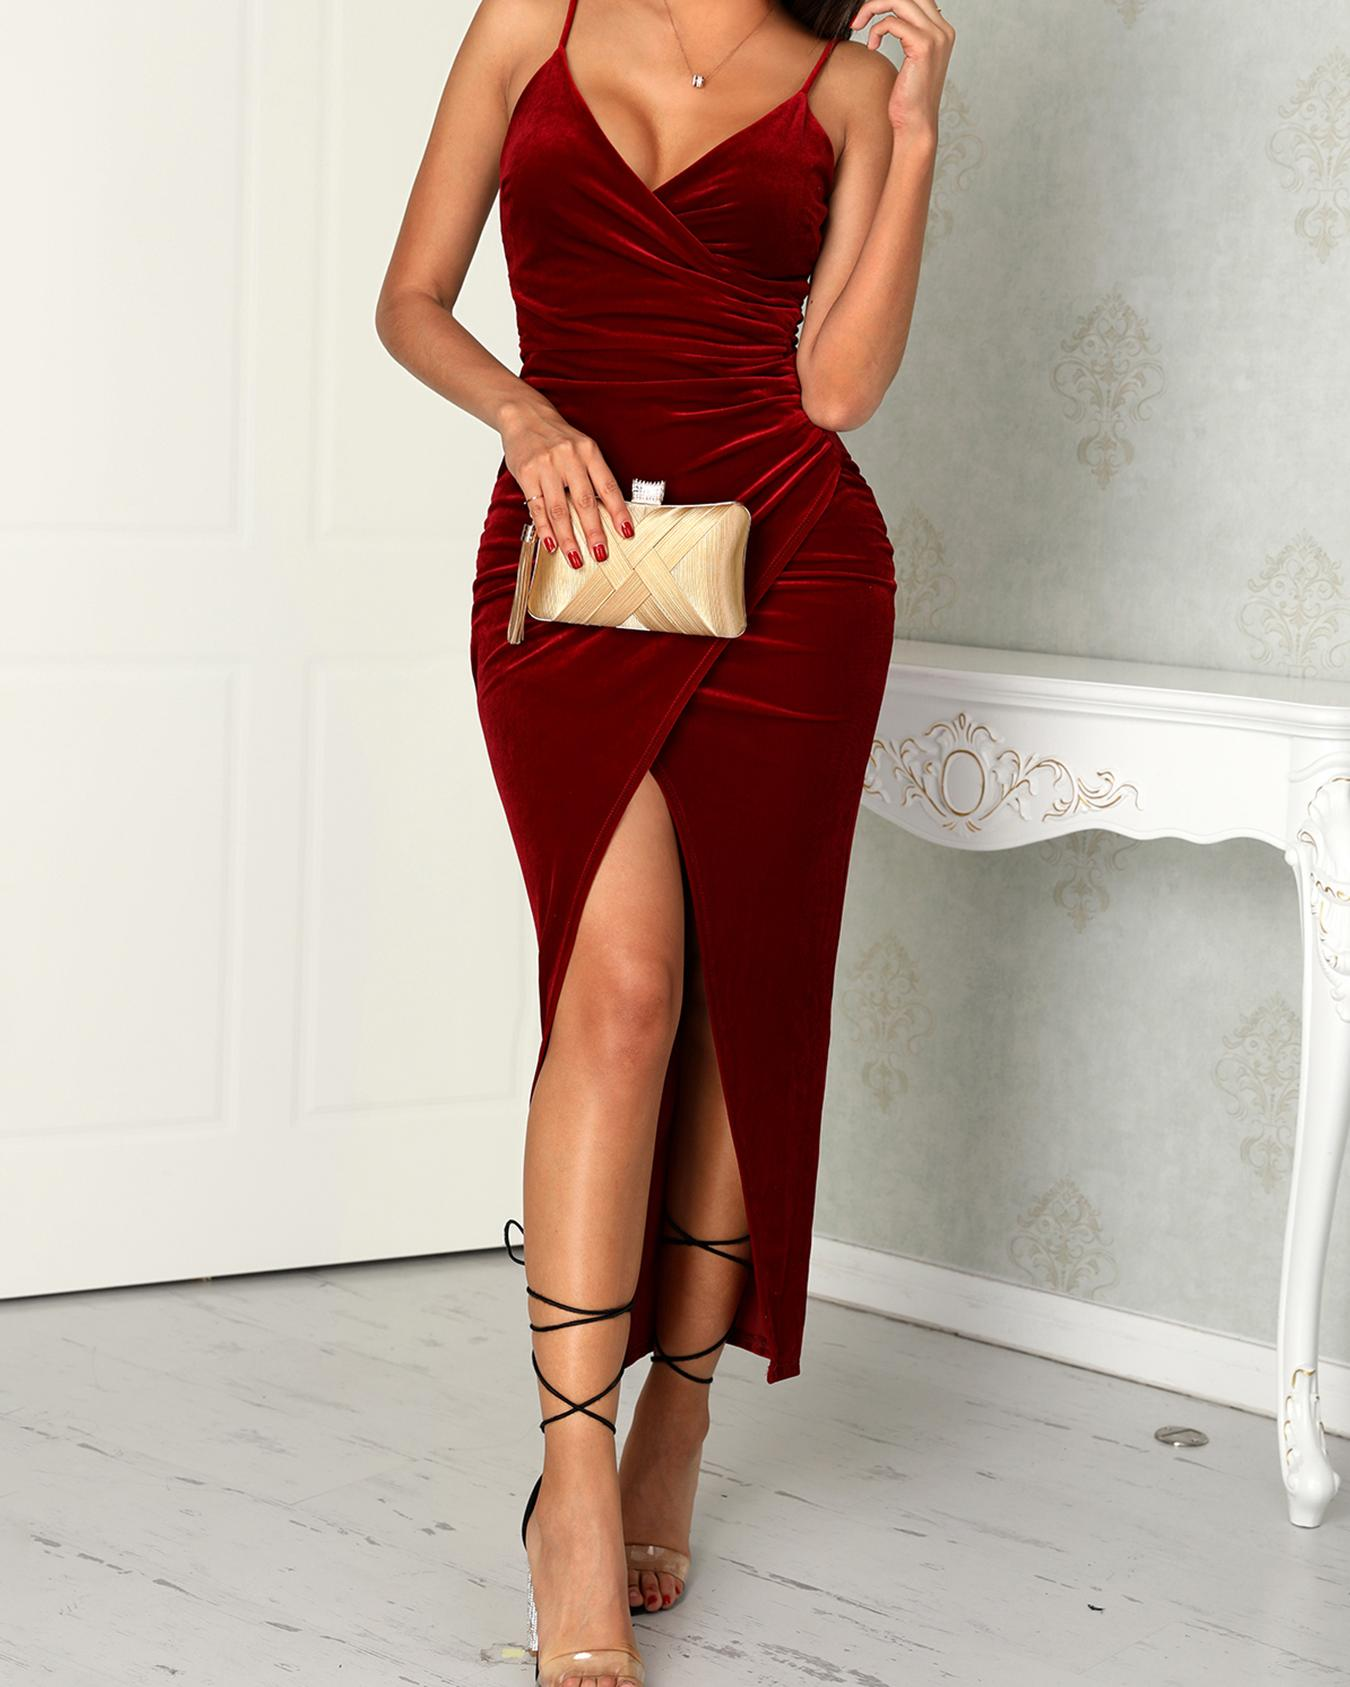 064e539a40 Spaghetti Strap Scrunhced Slit Dress Online. Discover hottest trend fashion  at chicme.com